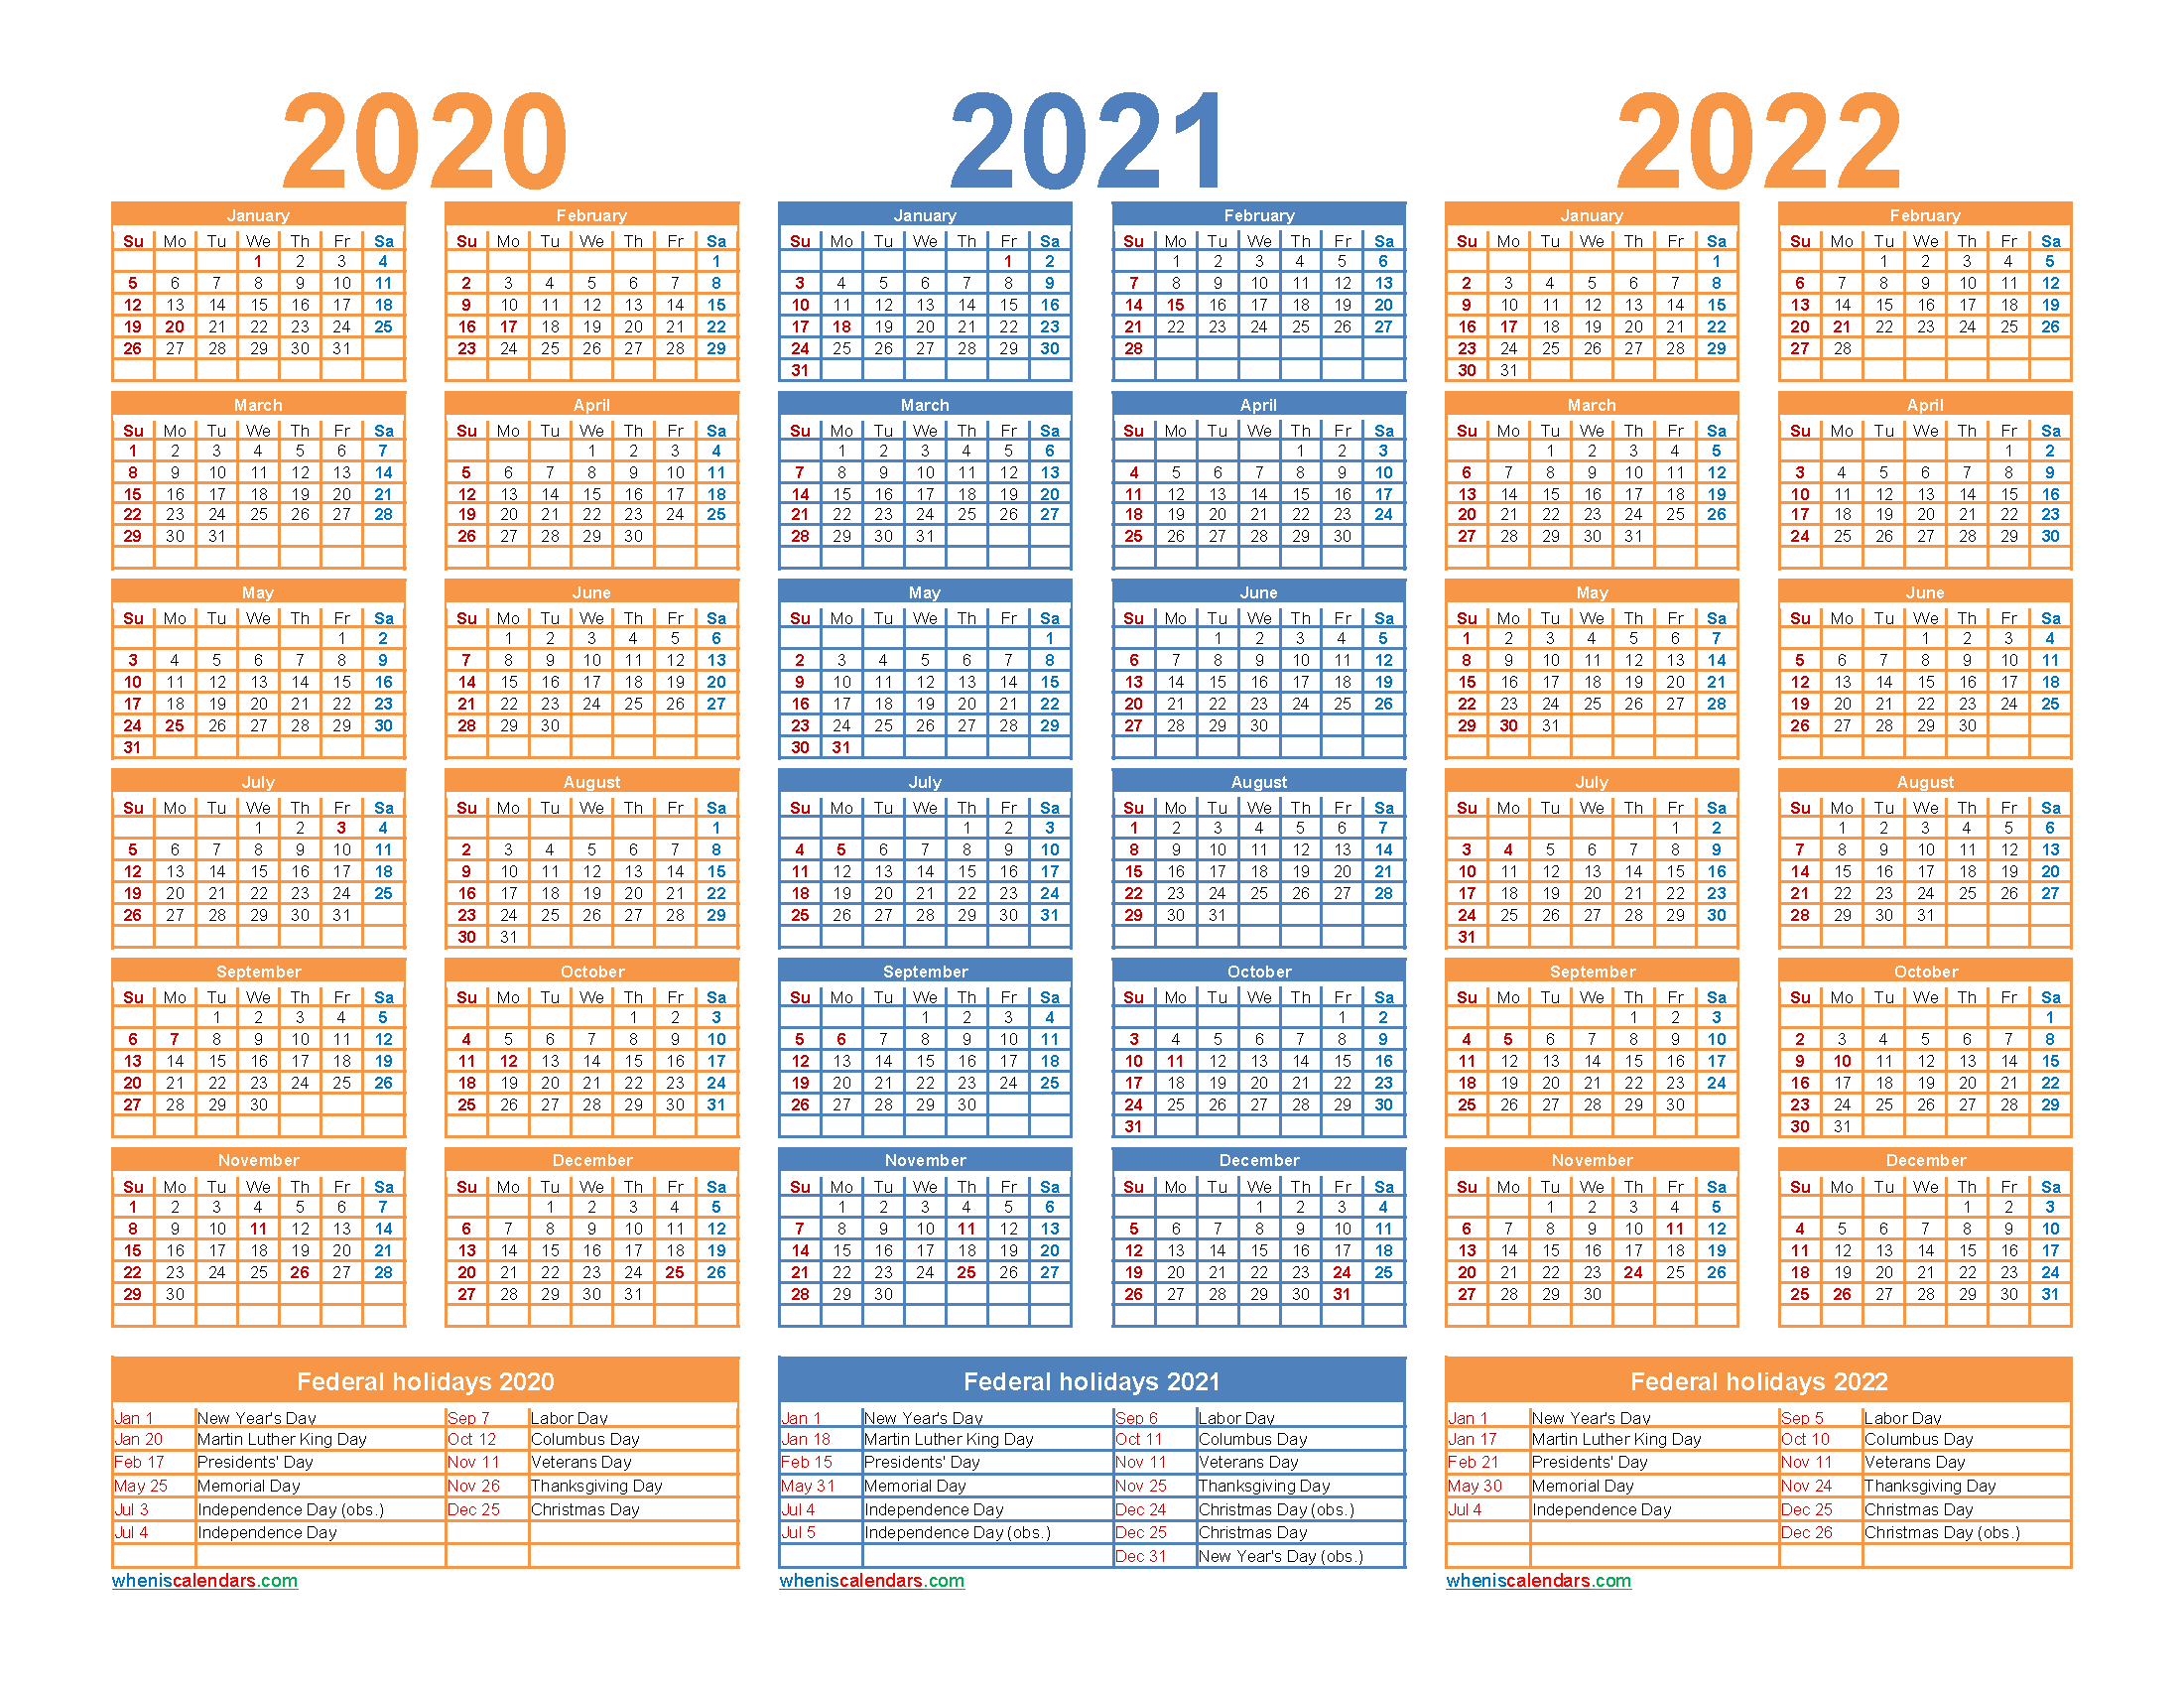 3 Year Calendar 2020 To 2022 Printable – Free Printable 2020 regarding Three Year Printable Calendar 2020 To 2023